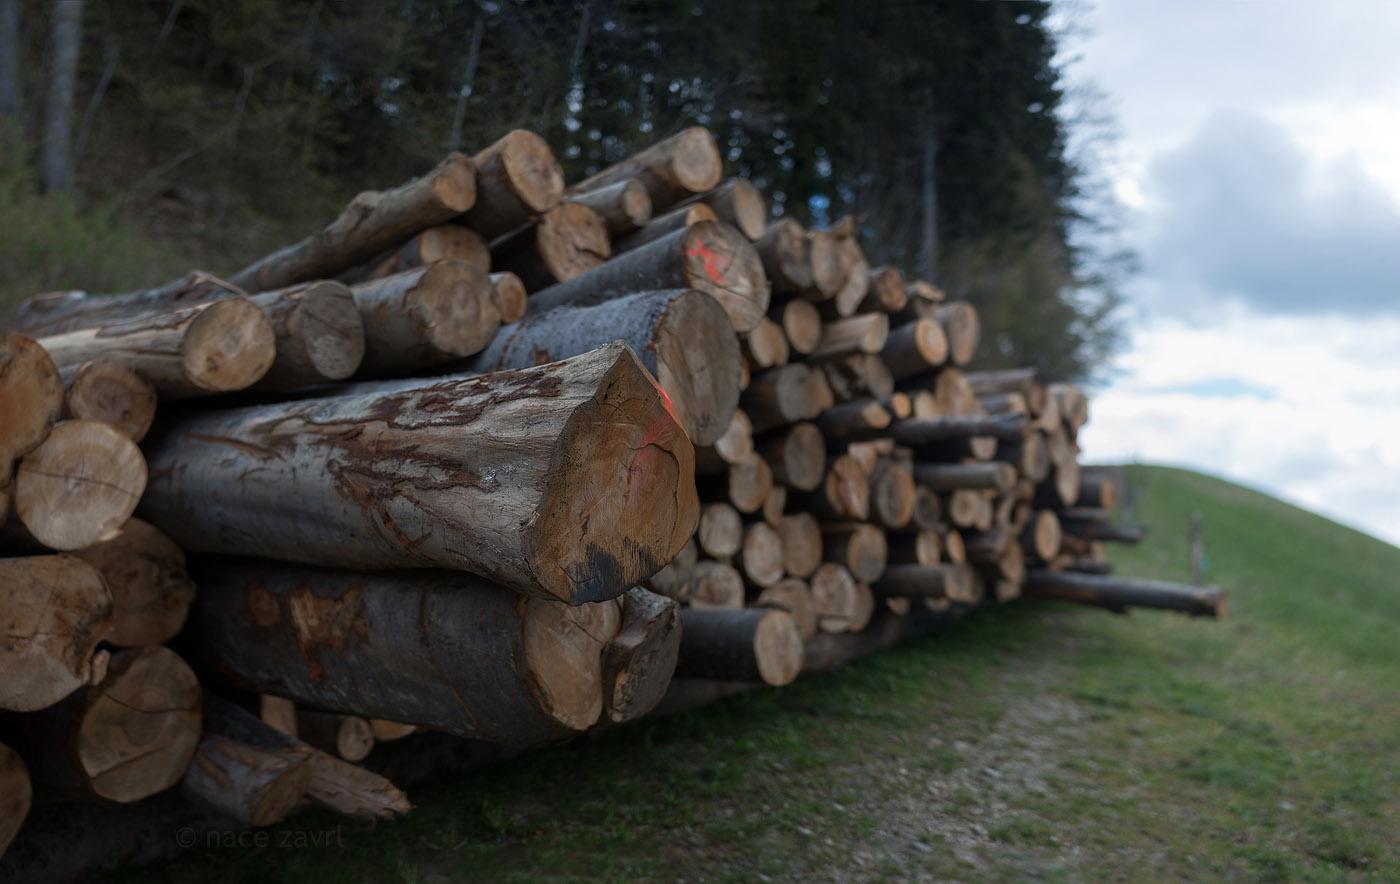 logs by the woods by Nace Zavrl